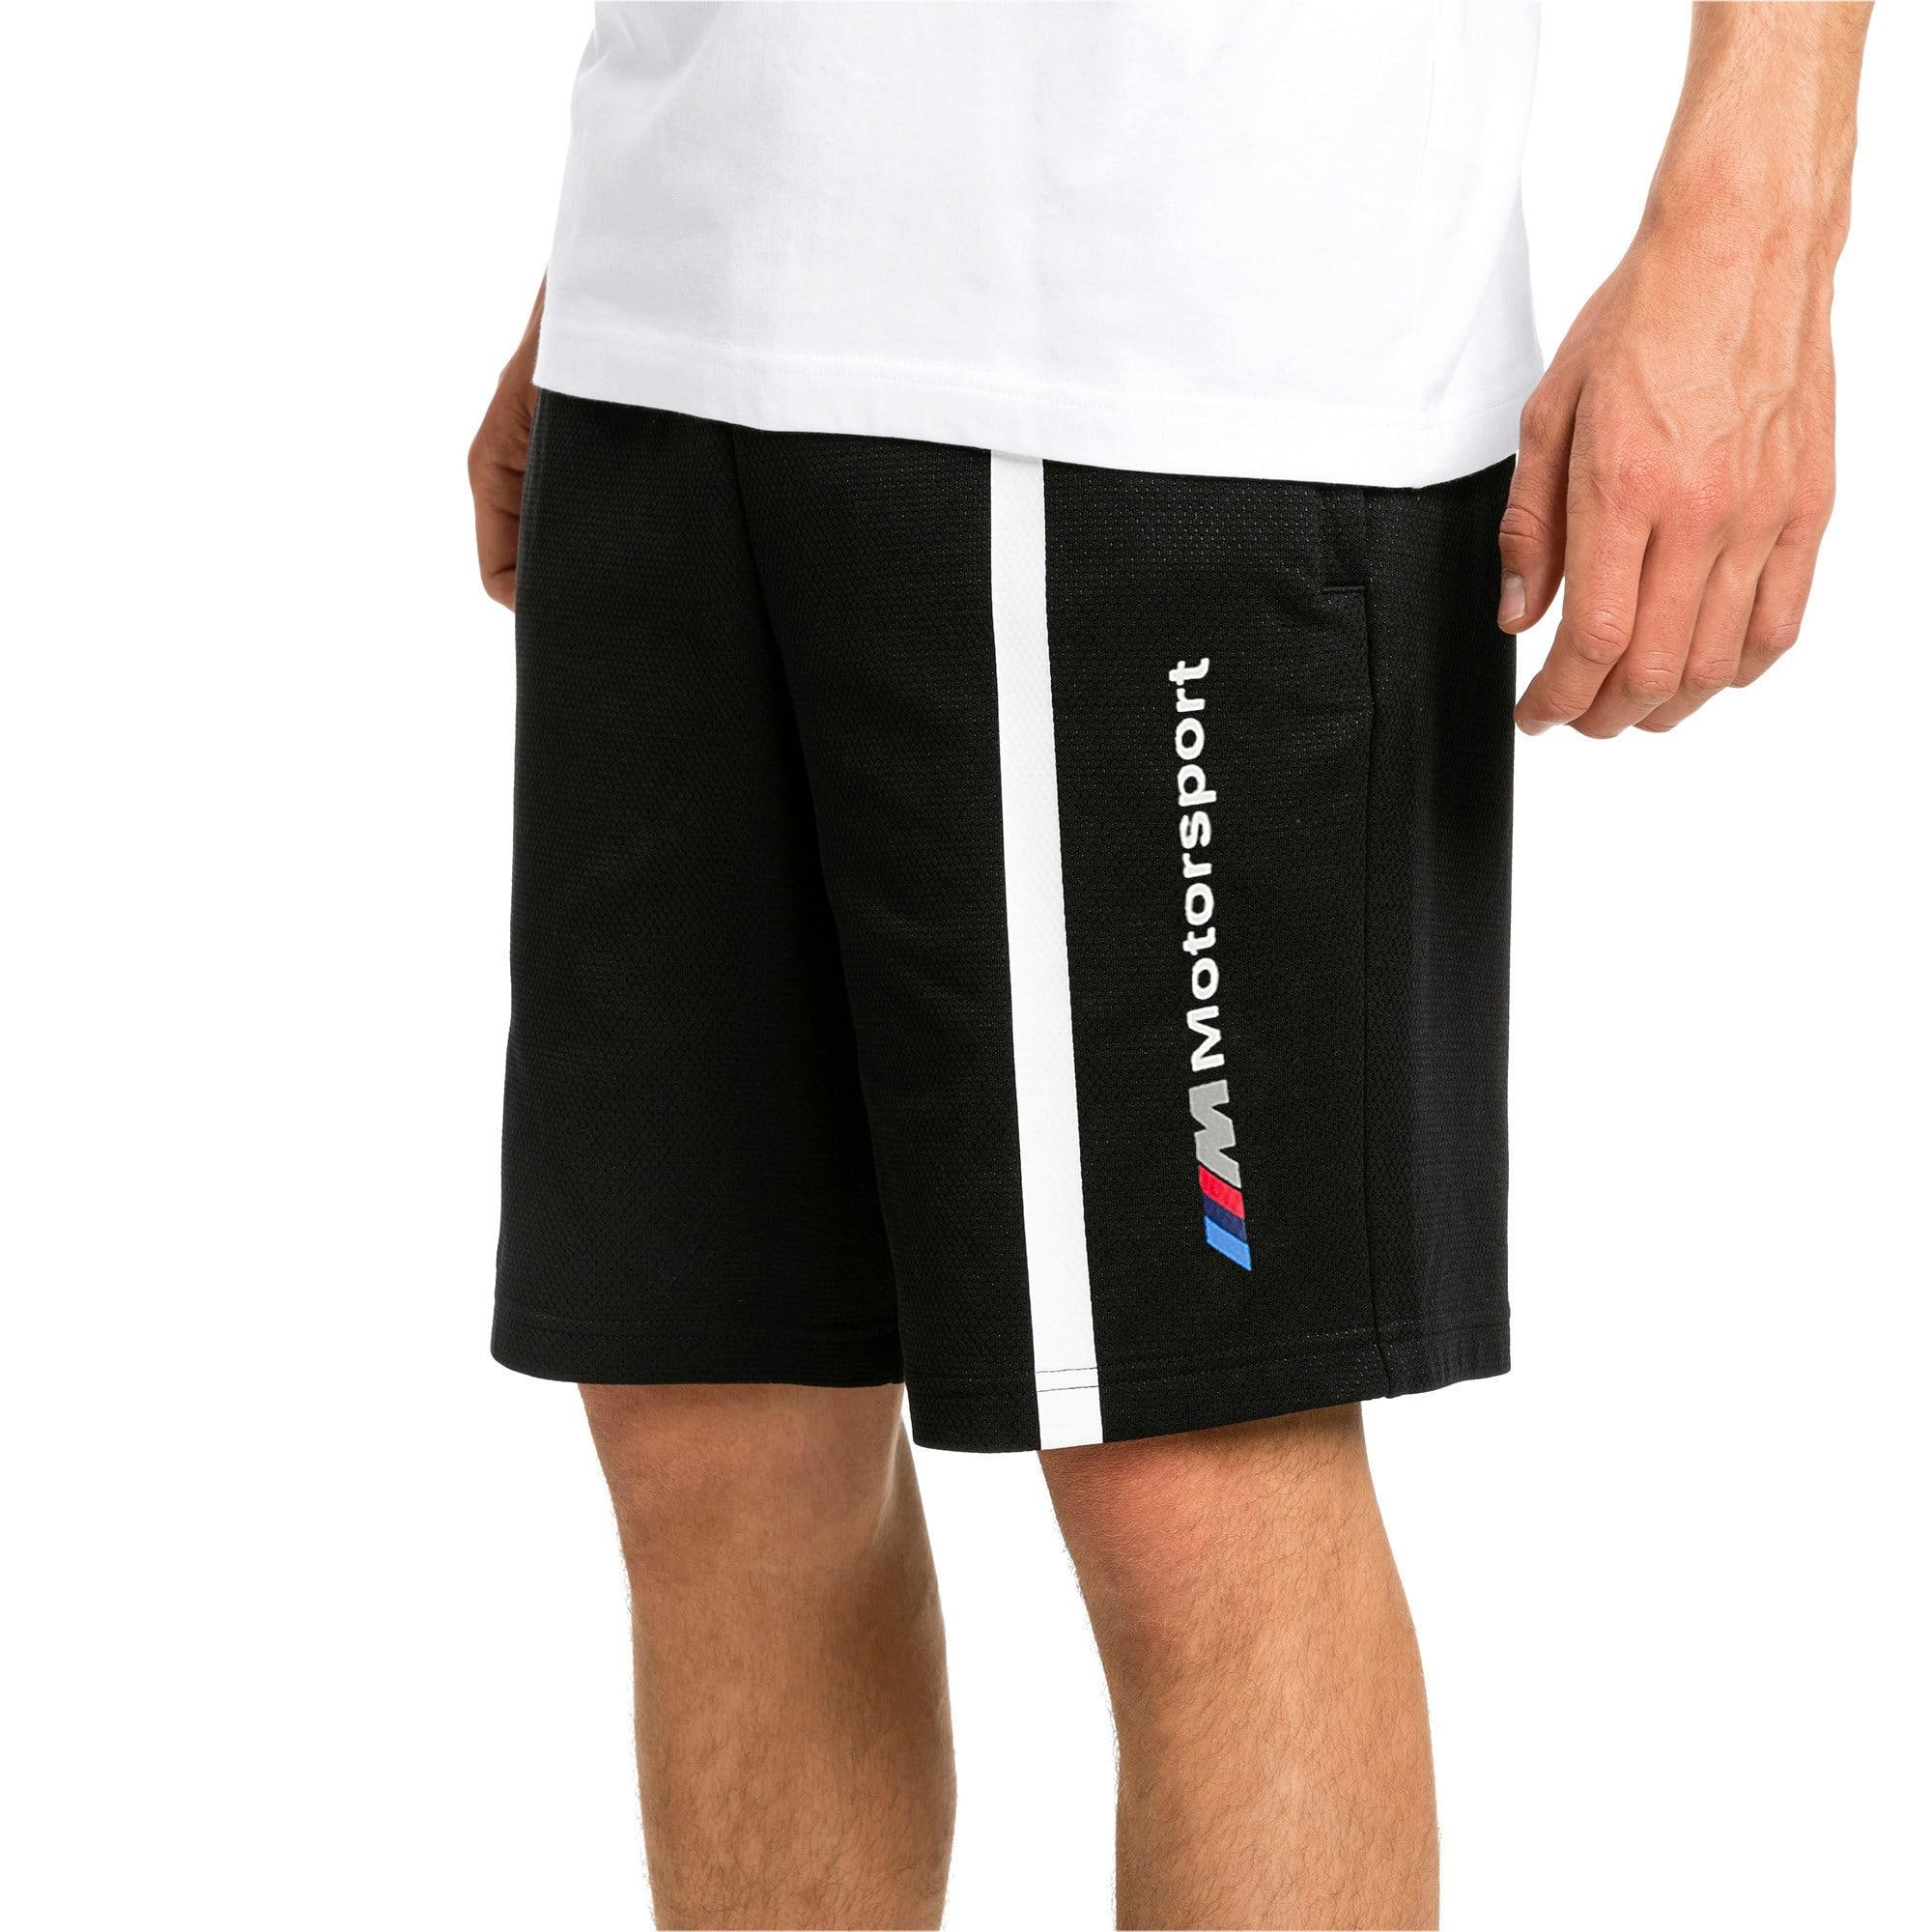 Thumbnail 1 of BMW Motorsport Men's Sweat Shorts, Puma Black, medium-IND